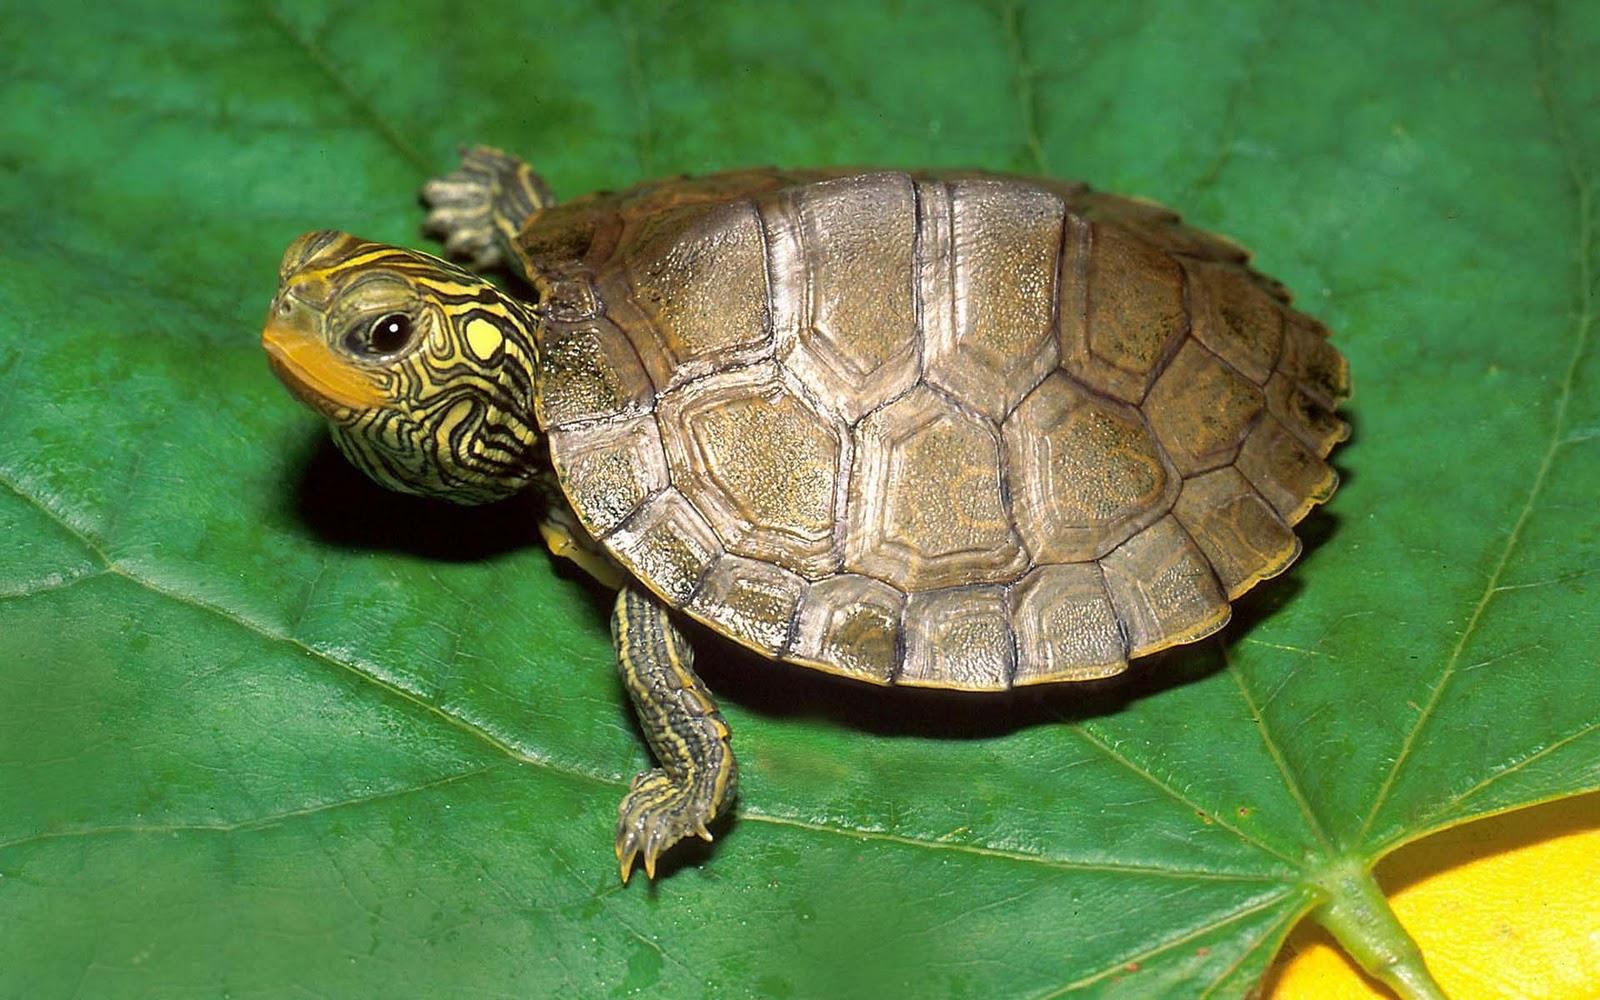 http://1.bp.blogspot.com/--ce8XTvoMrQ/TyAavpFKdcI/AAAAAAAAXwk/-UgrdaHCvNw/s1600/Schildpadden-achtergronden-dieren-hd-schildpad-wallpapers-foto-11.jpg